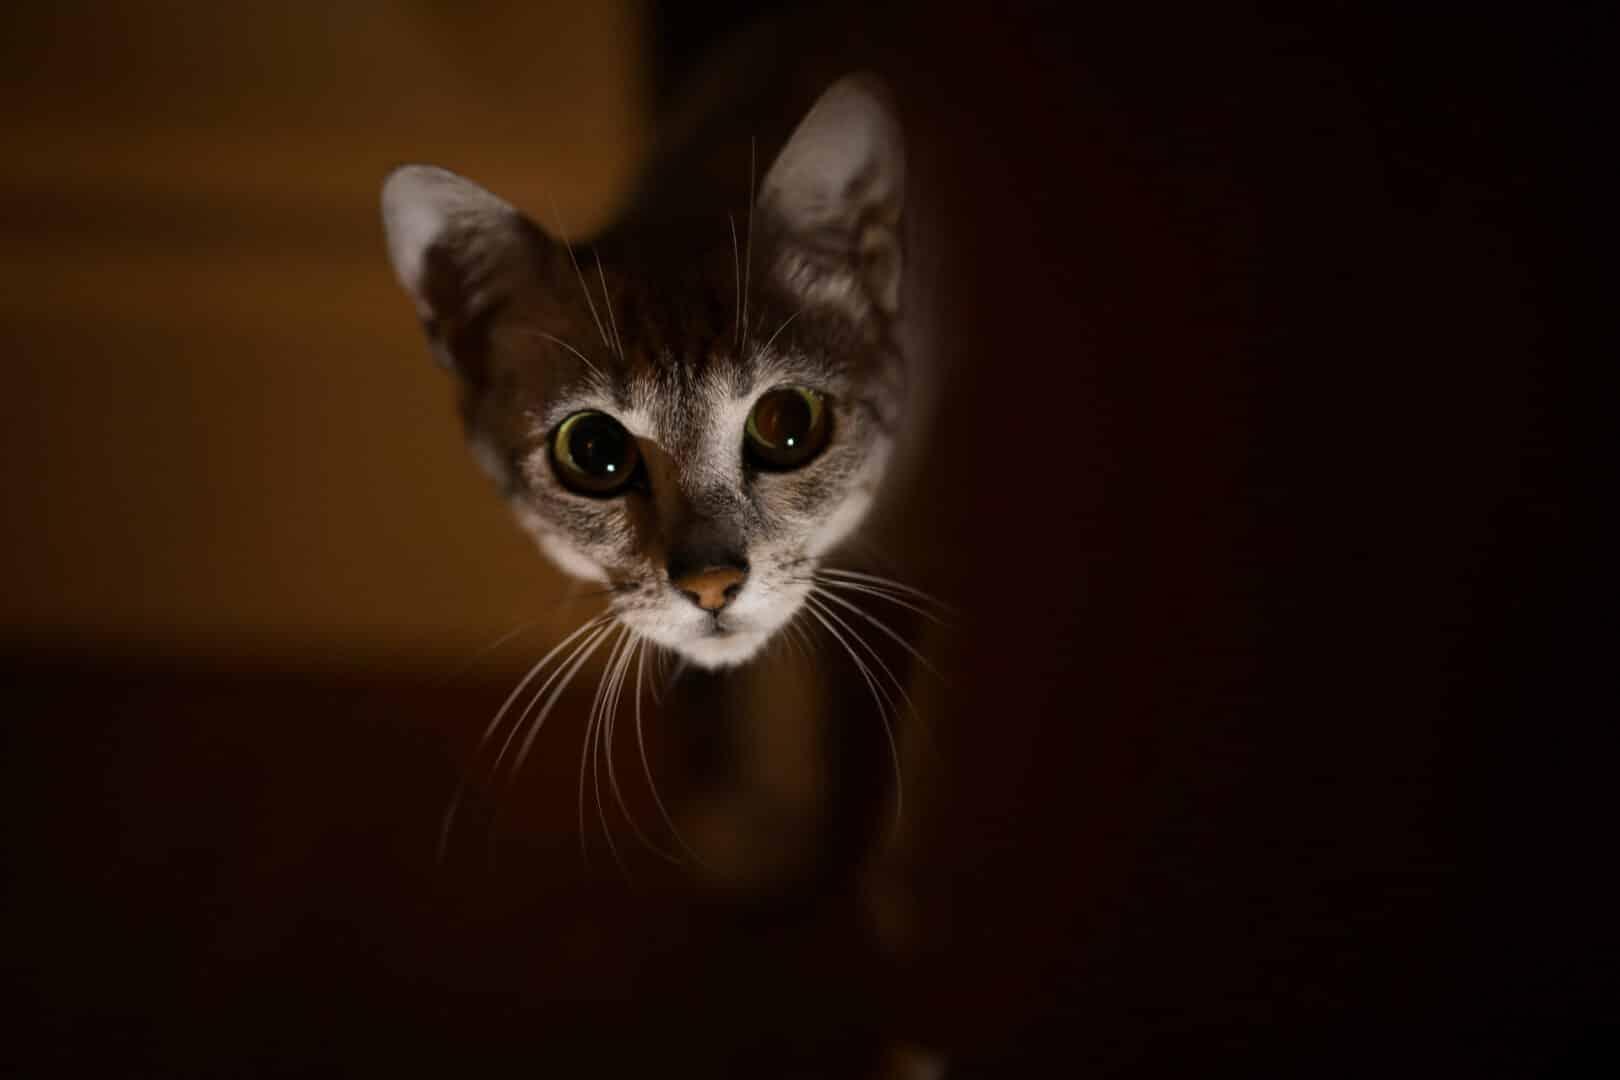 cat walking around at night